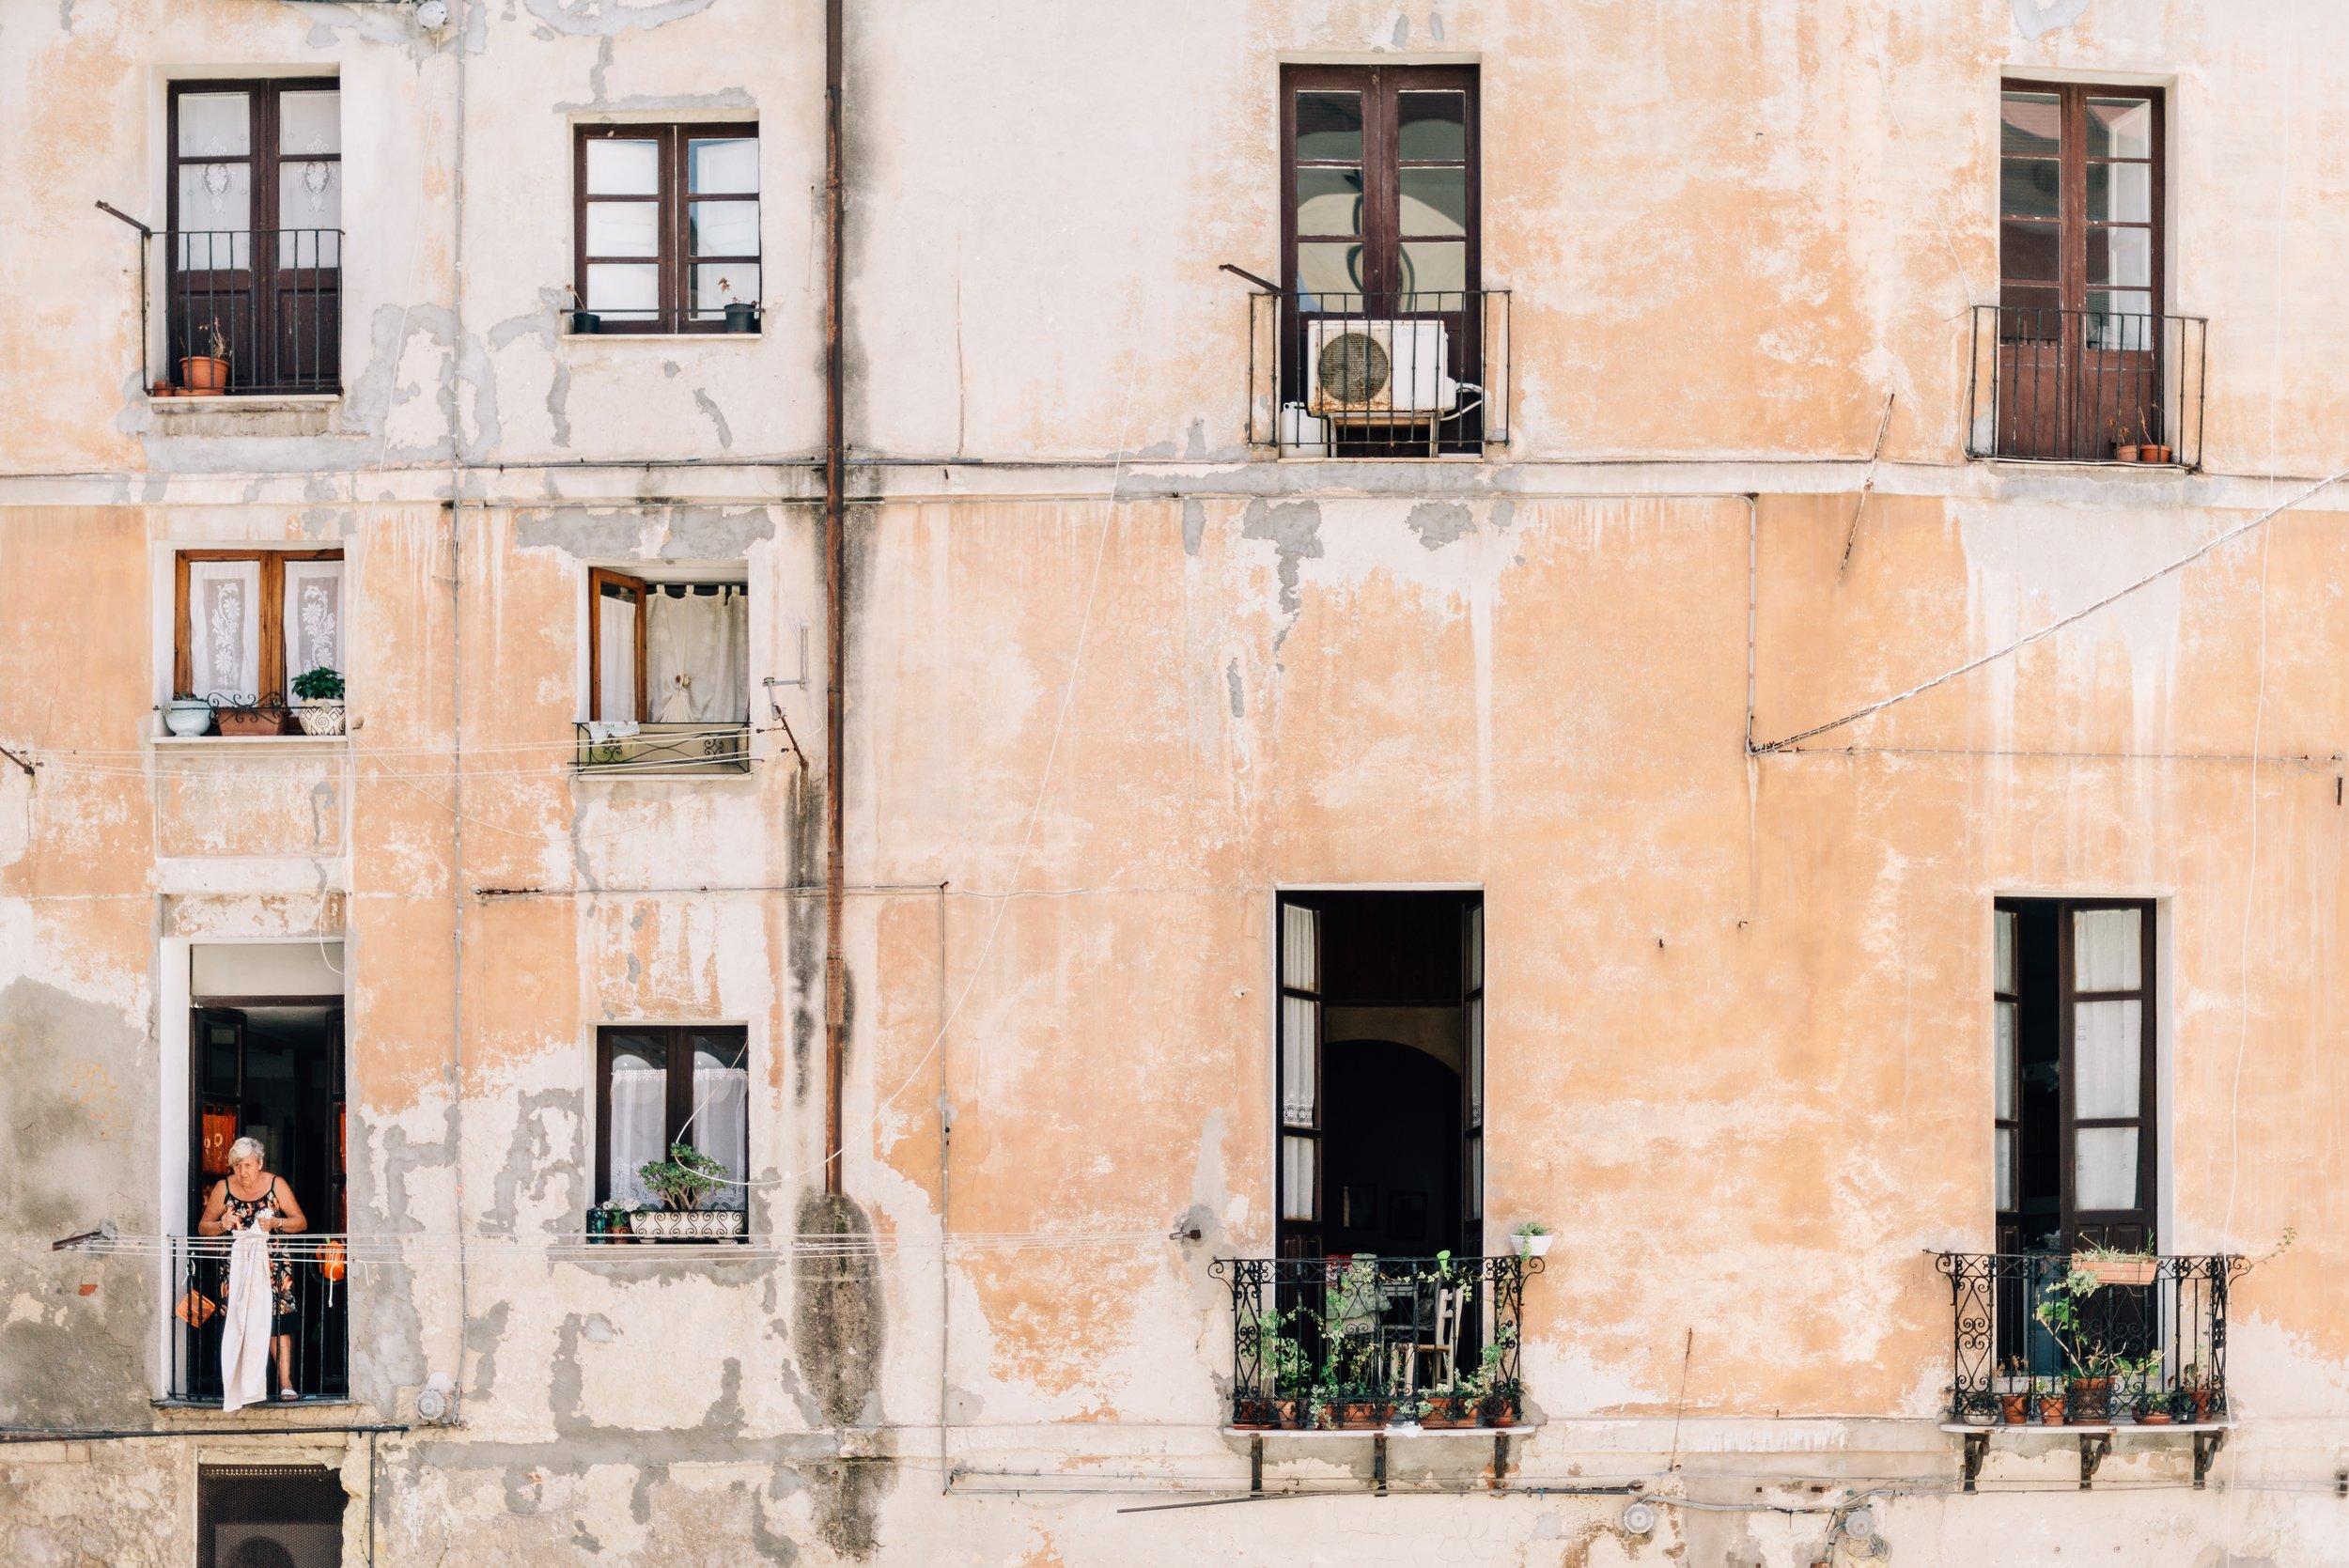 Italy-building.jpg